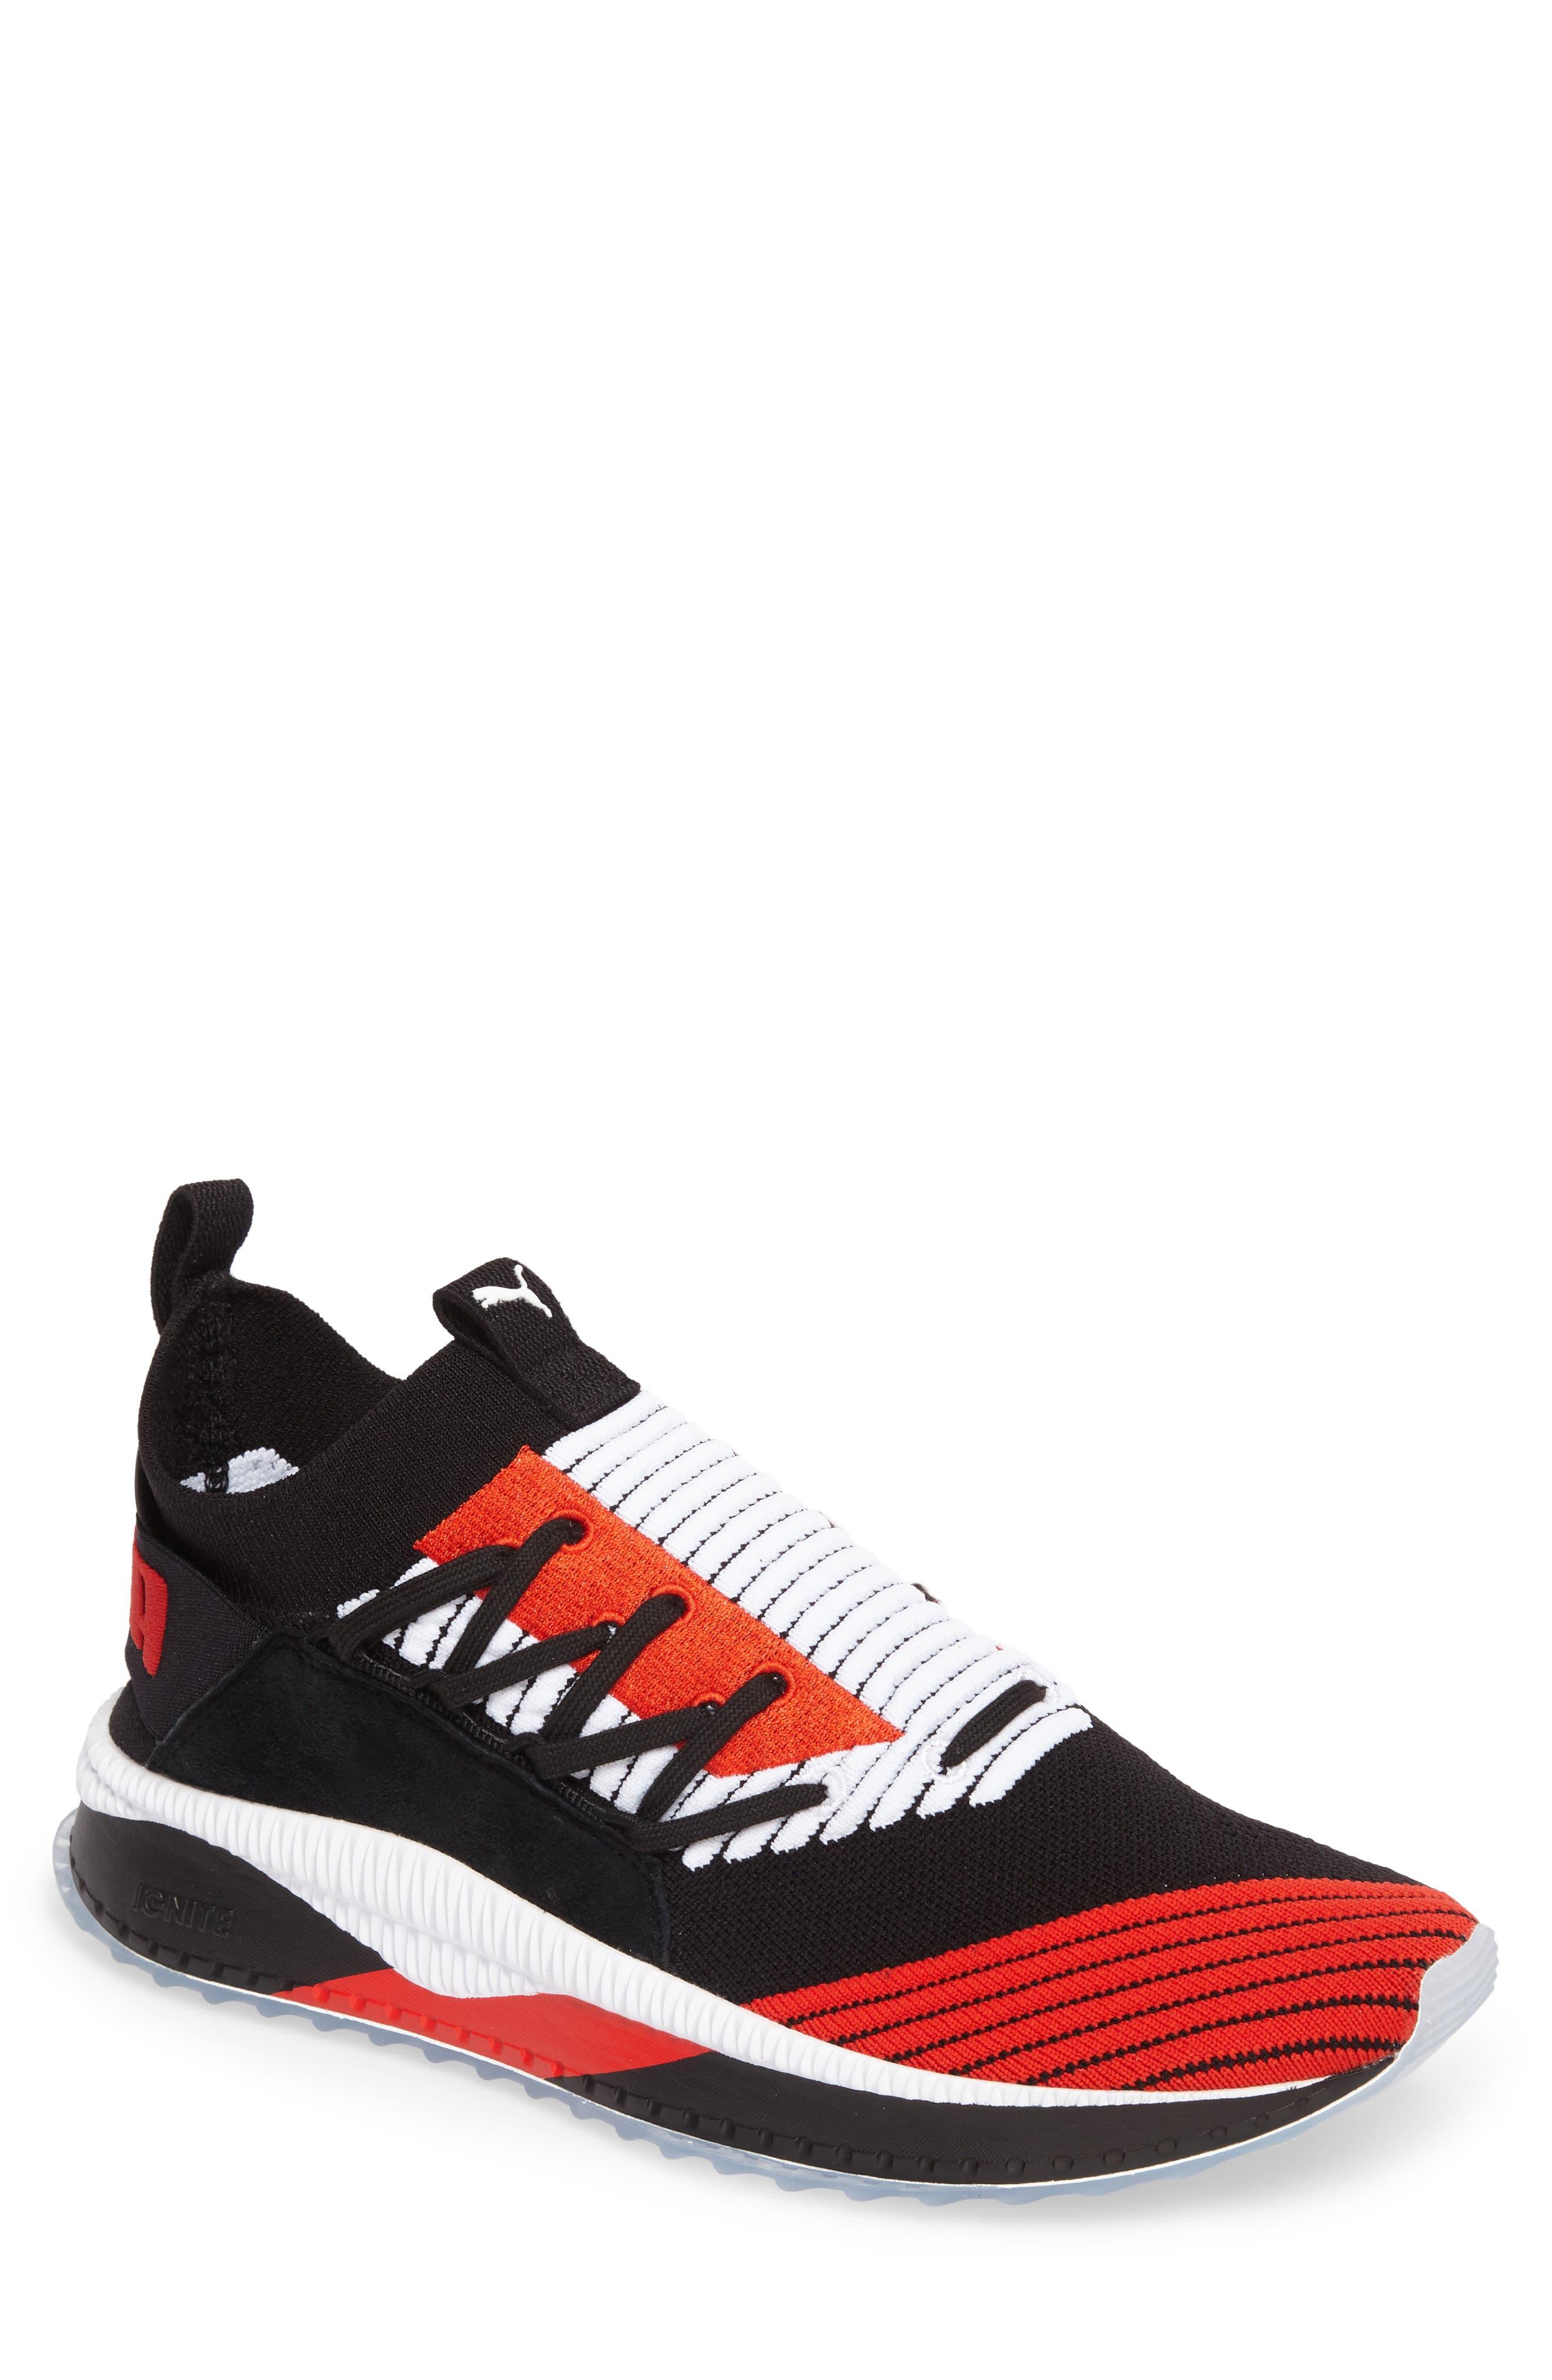 Tsugi Shinsei UT Odyssey Sneaker,                         Main,                         color, Black/White/Flame Scarlet